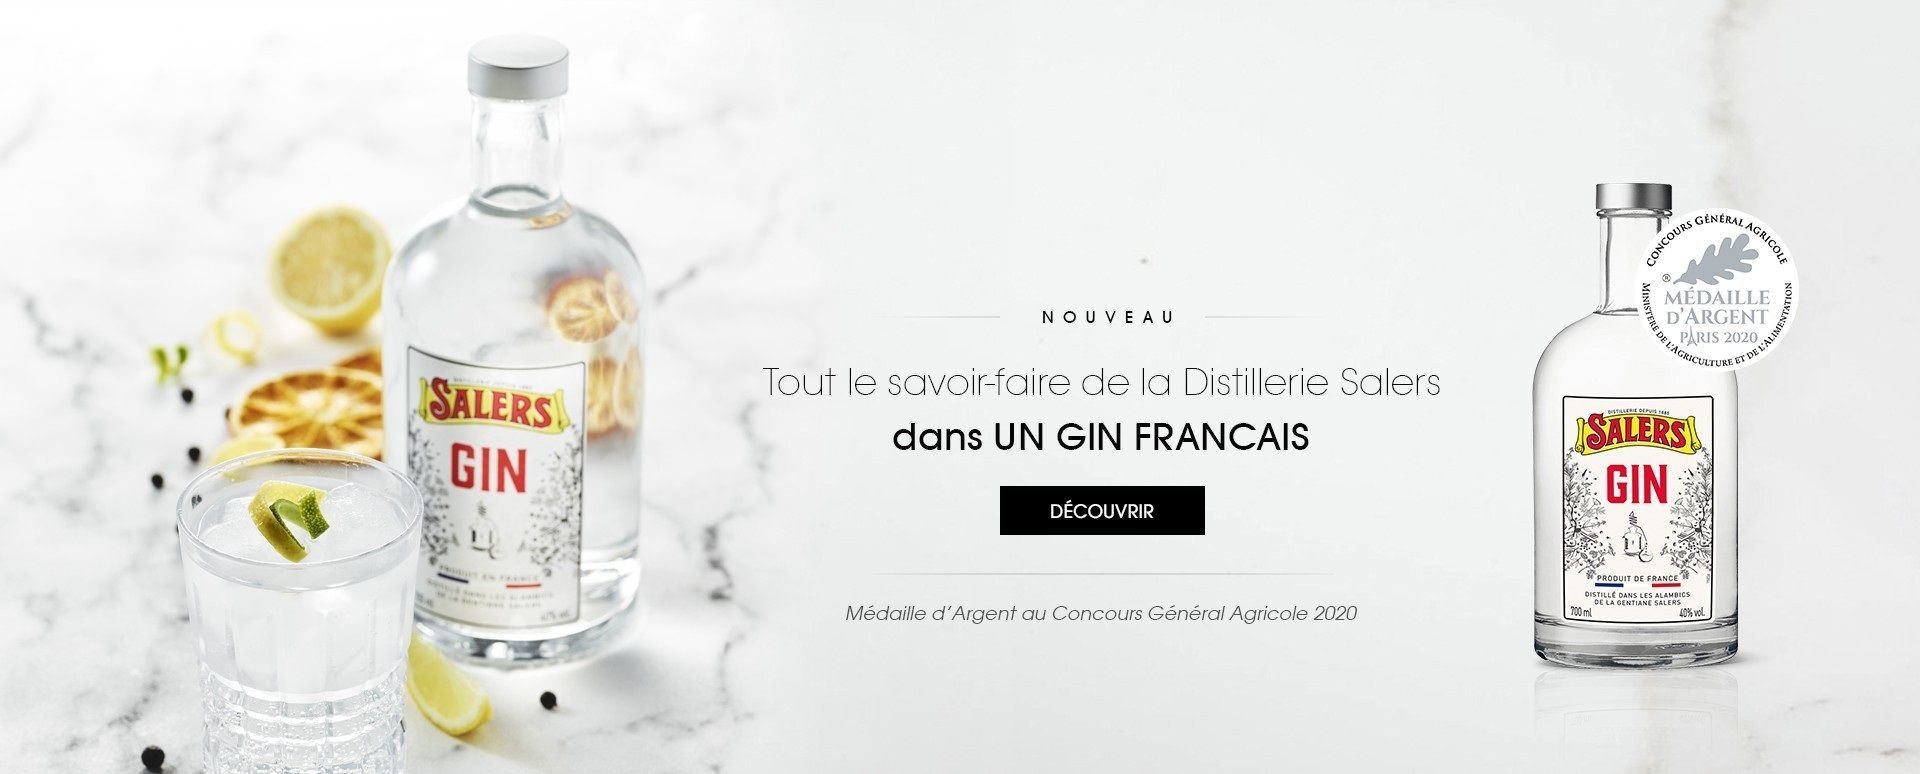 Gin SALERS